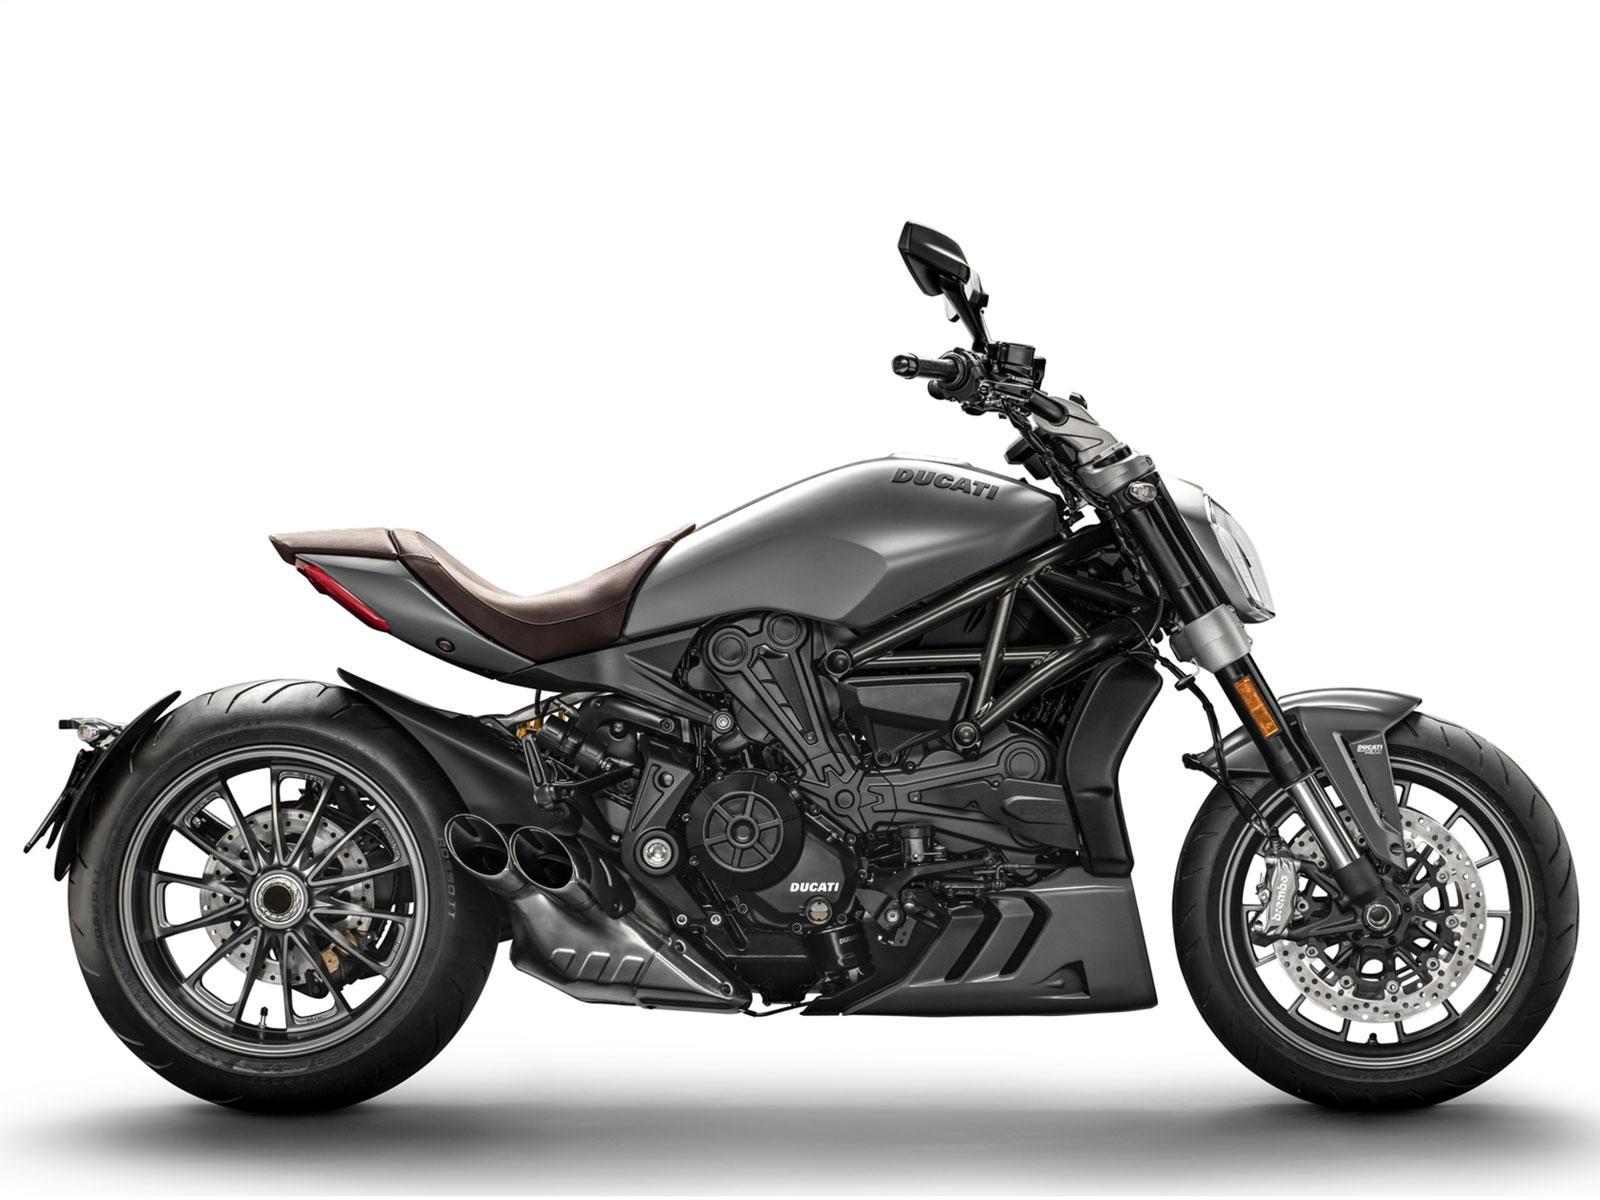 Мотоцикл DUCATI XDiavel - Matt Liquid Concrete Grey (2019)